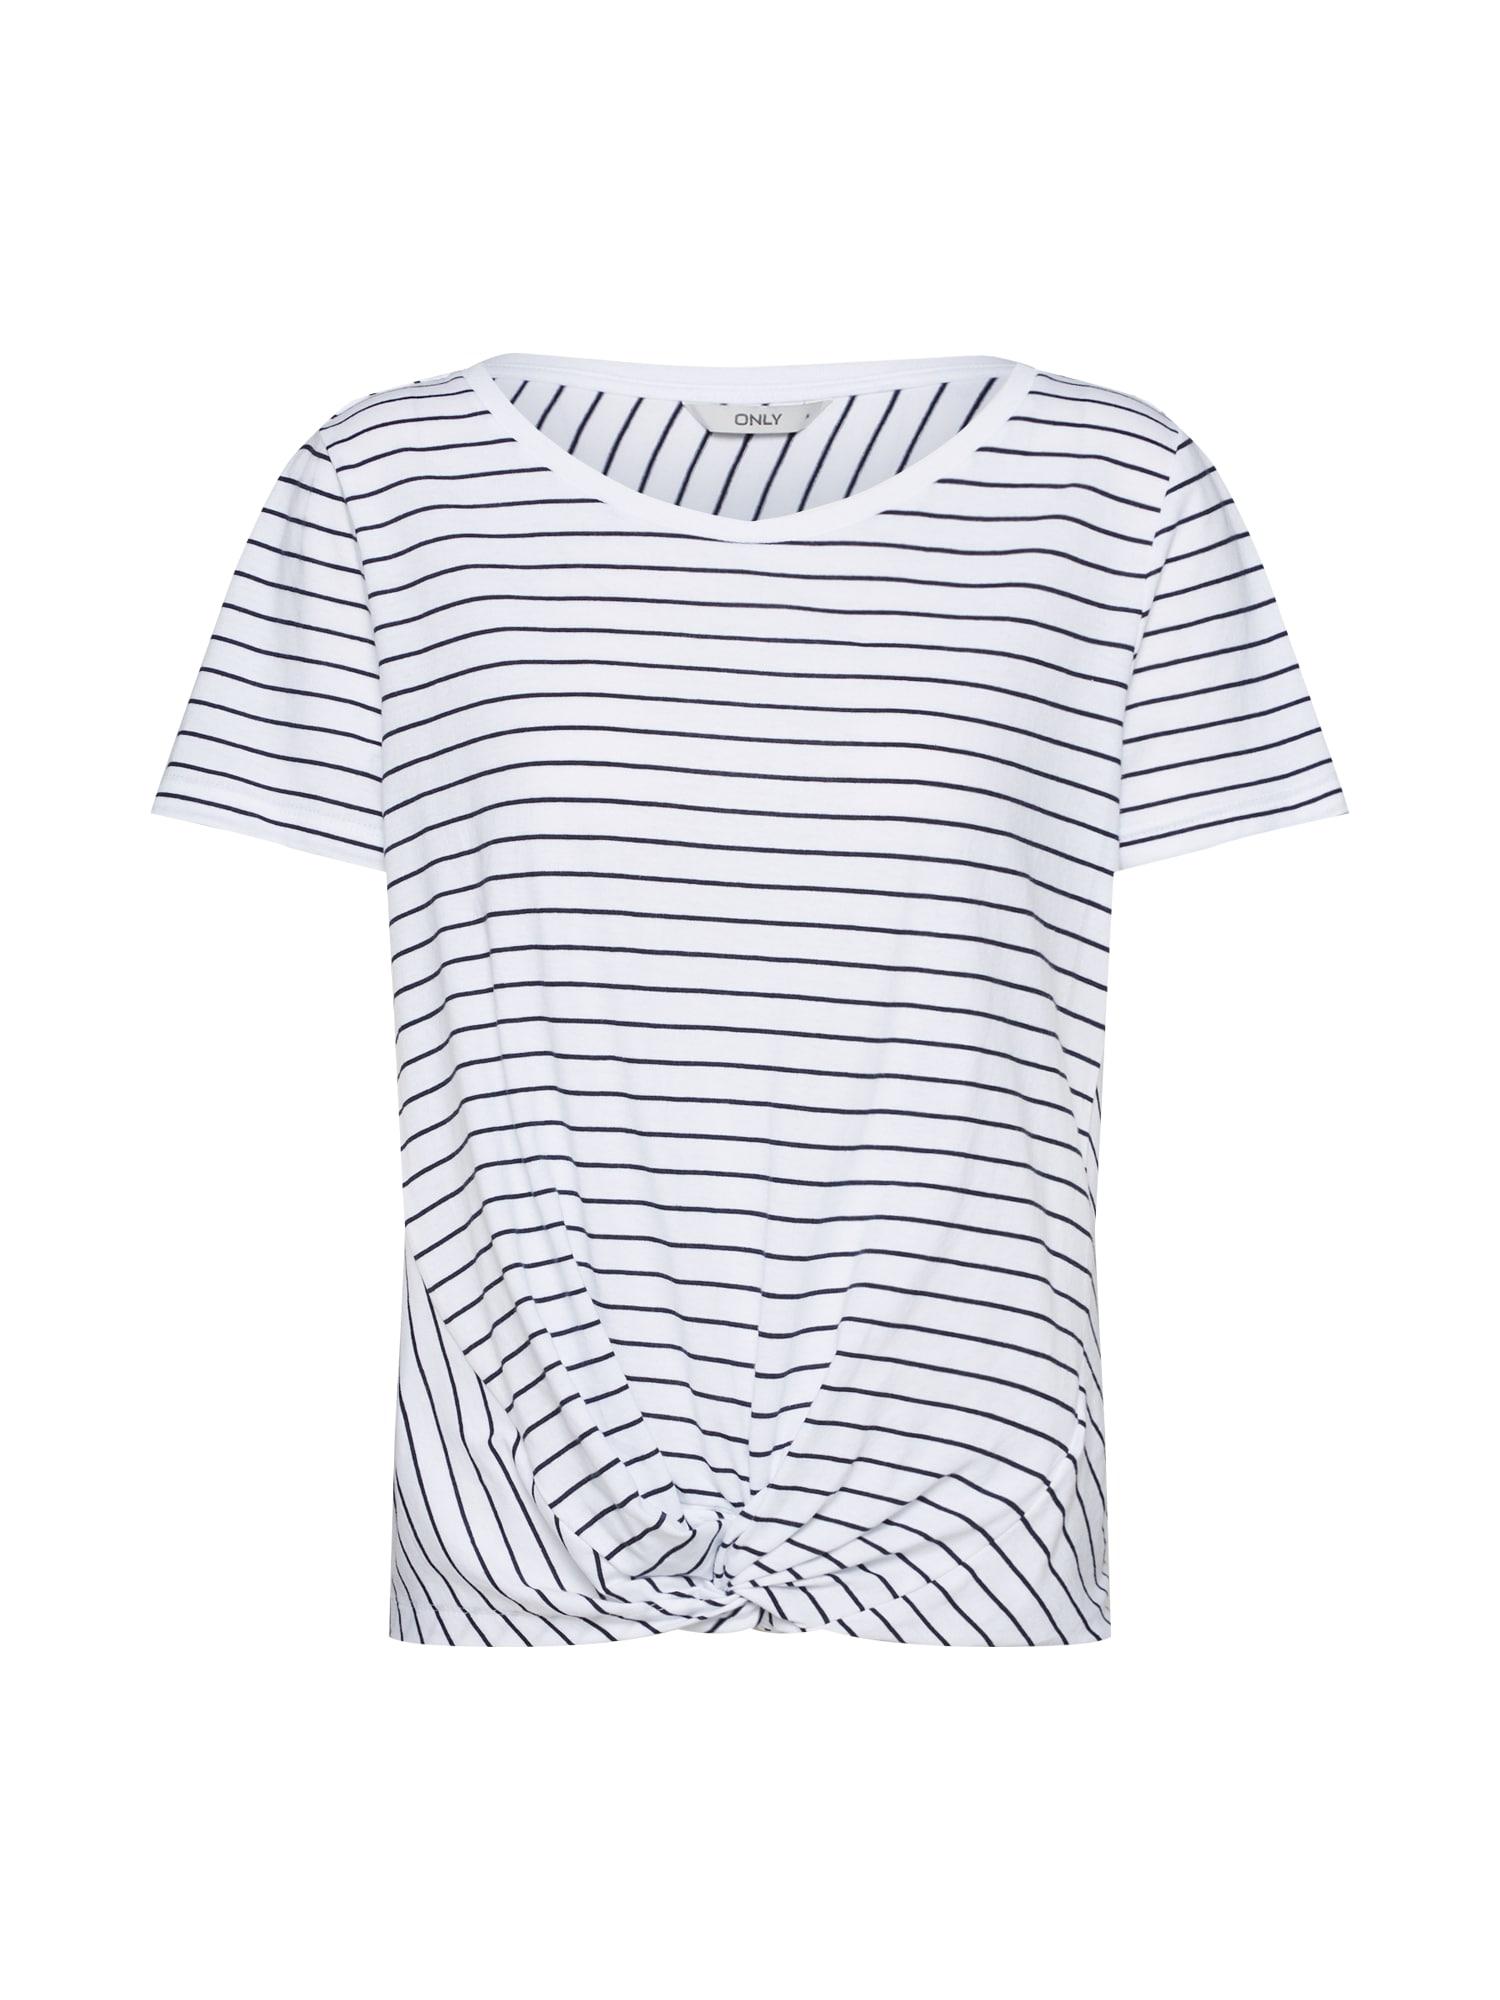 Tričko černá bílá ONLY